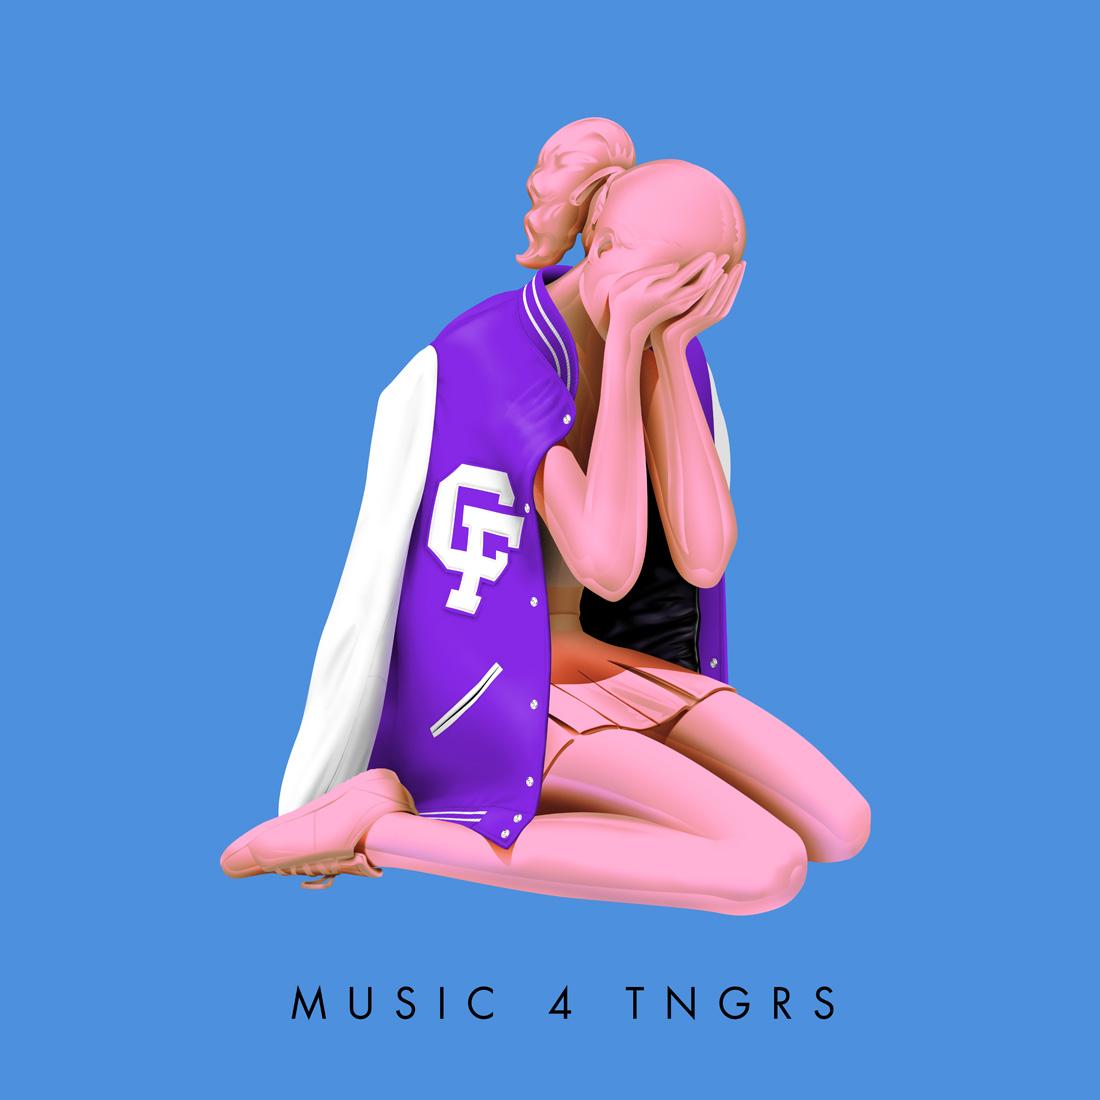 music-4-tngrs